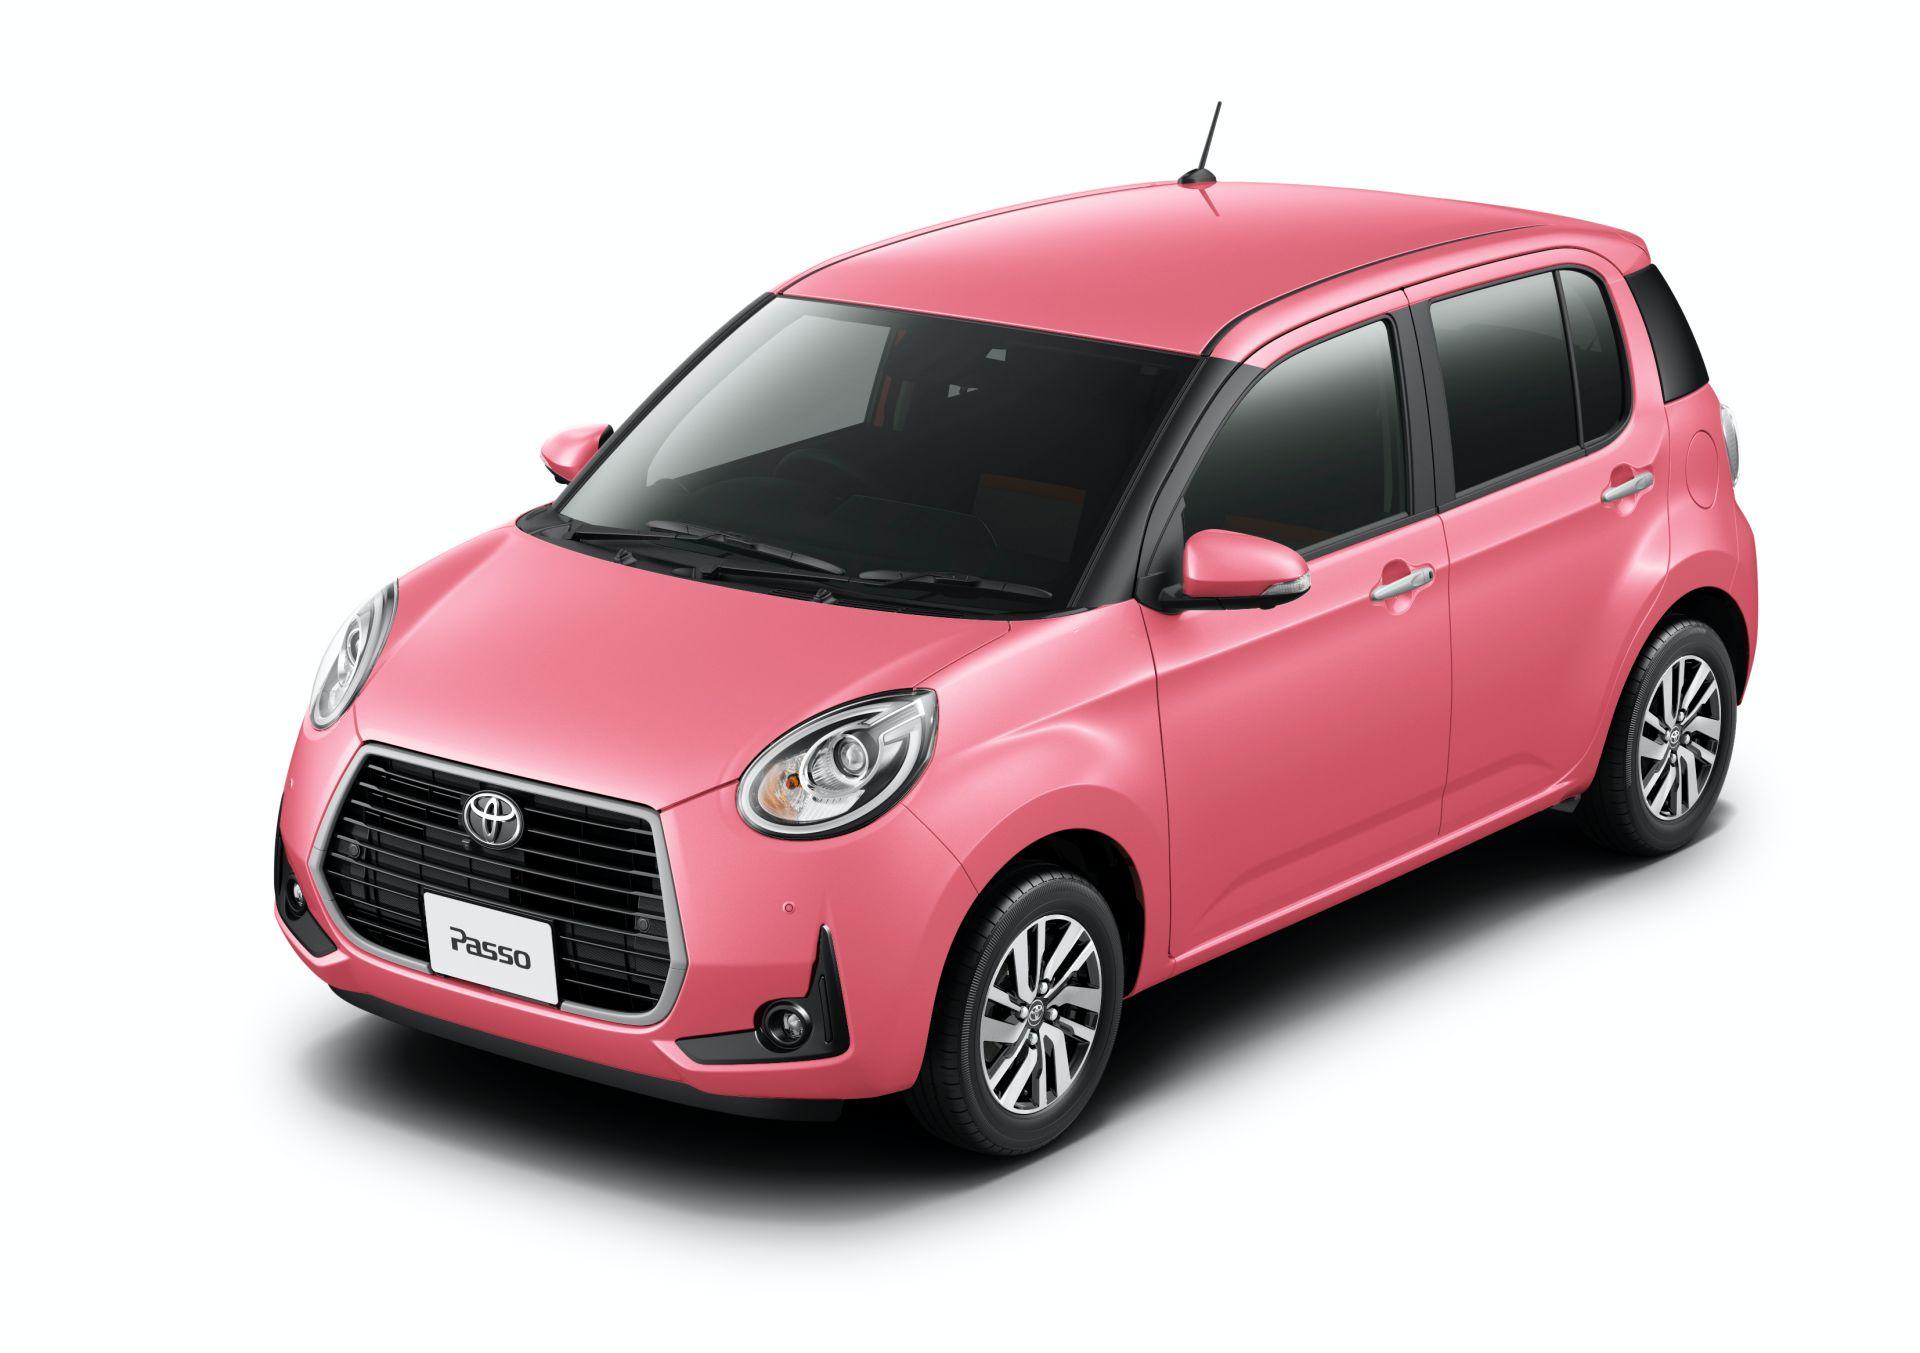 Toyota_Passo_Moda_Charm_0002